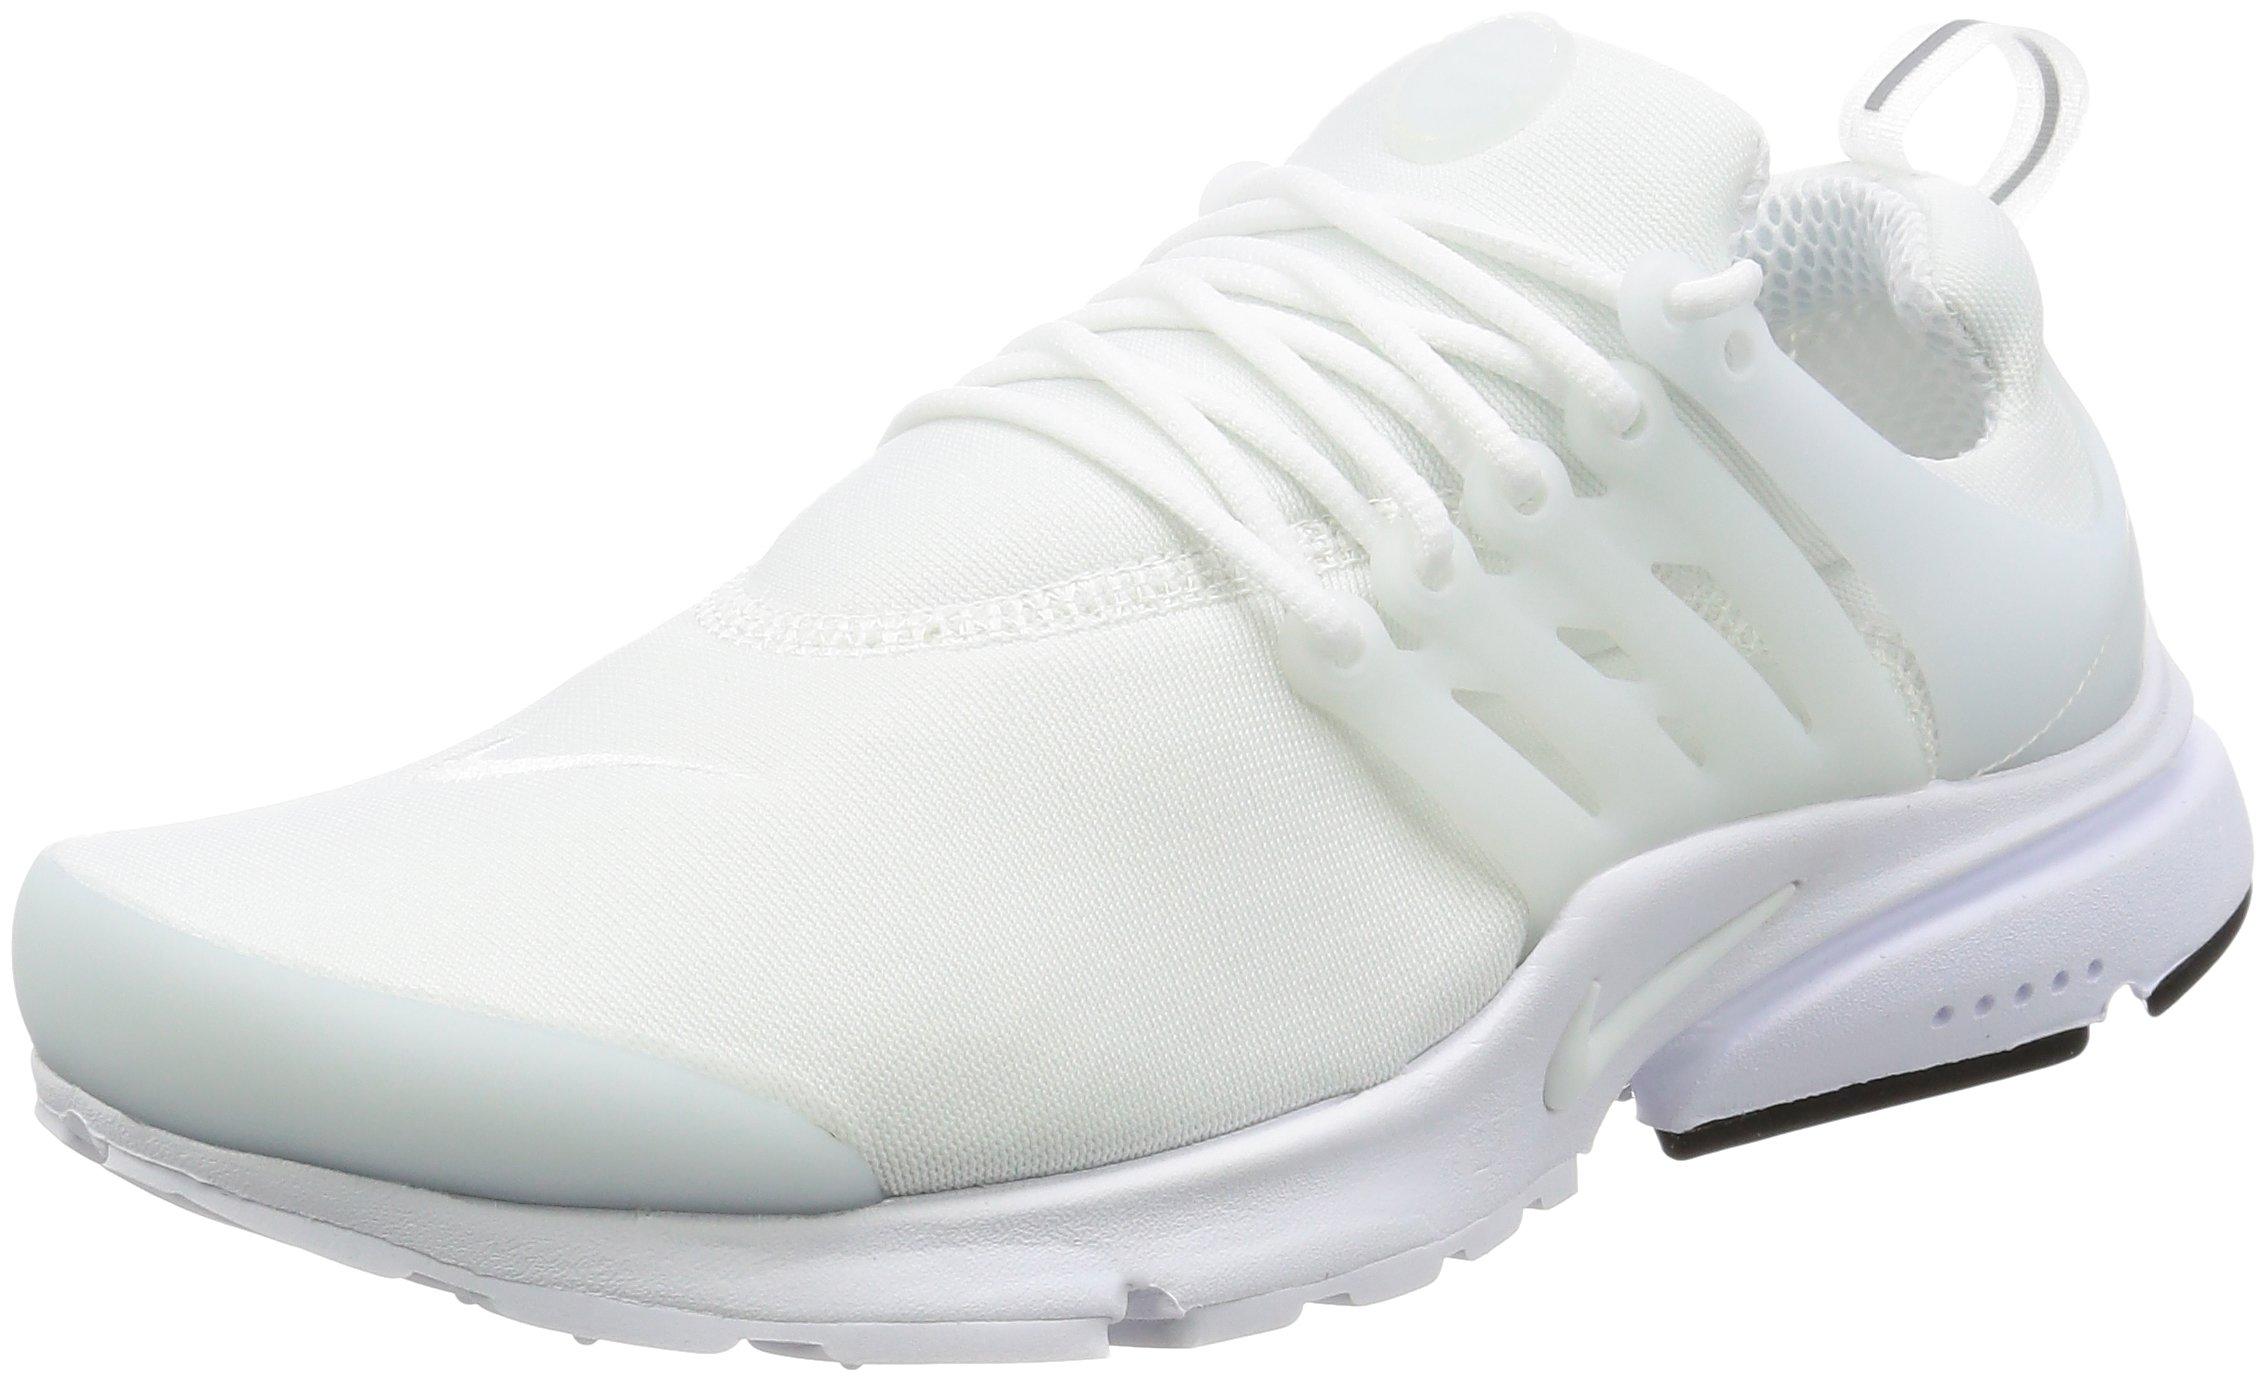 Nike 848187 100: Mens Air Presto Essential WhiteWhiteBlack Training Sneakers (11 D(M) US Men)